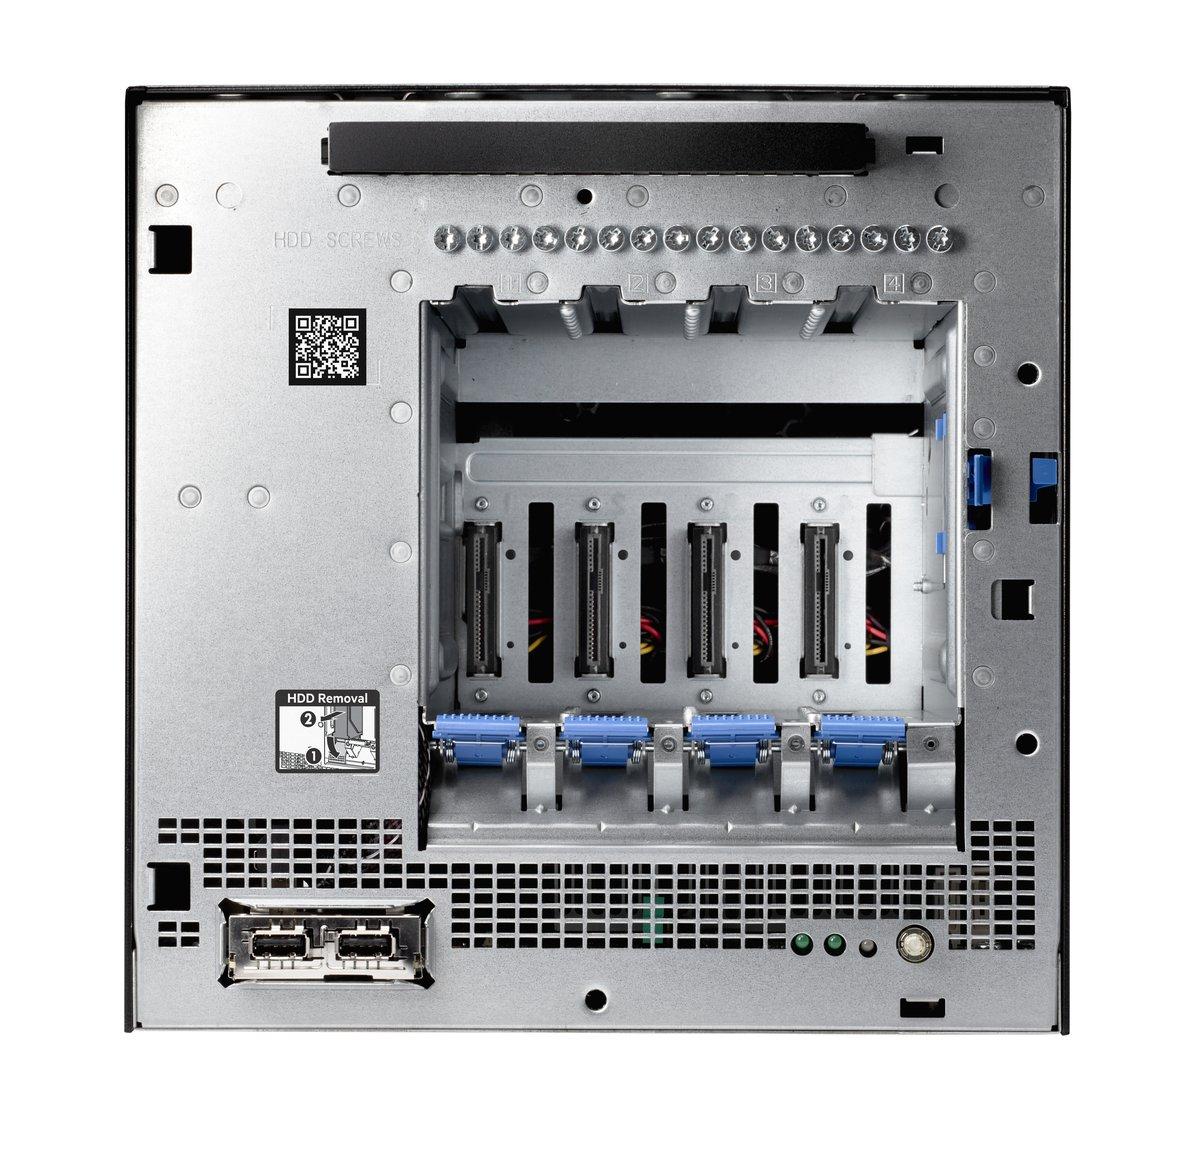 slide 1 of 10,show larger image, hpe proliant microserver gen10 x3418 1p 8gb-u 4lff nhp 200w ps perf server